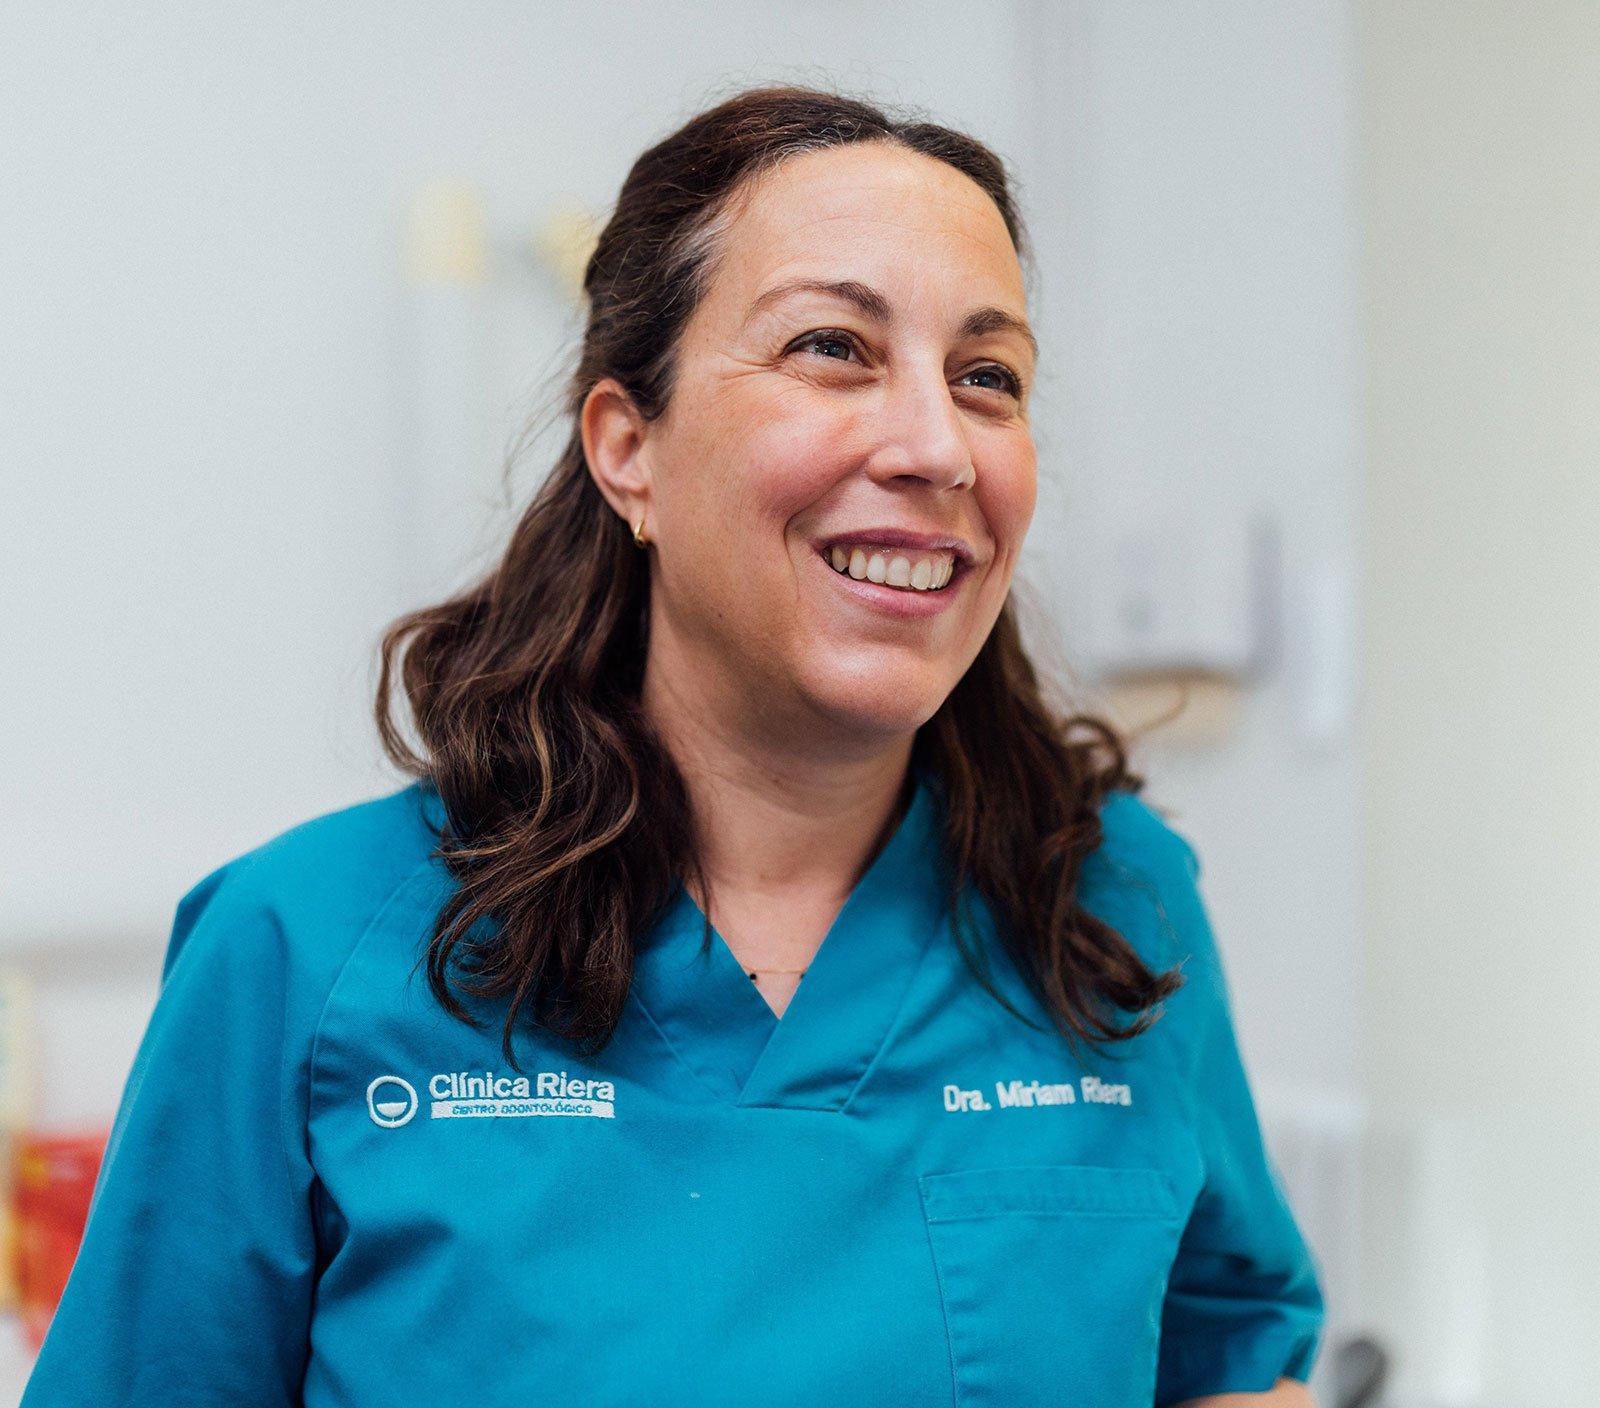 Dra. Miriam Riera Puñet | Colegiada 3931